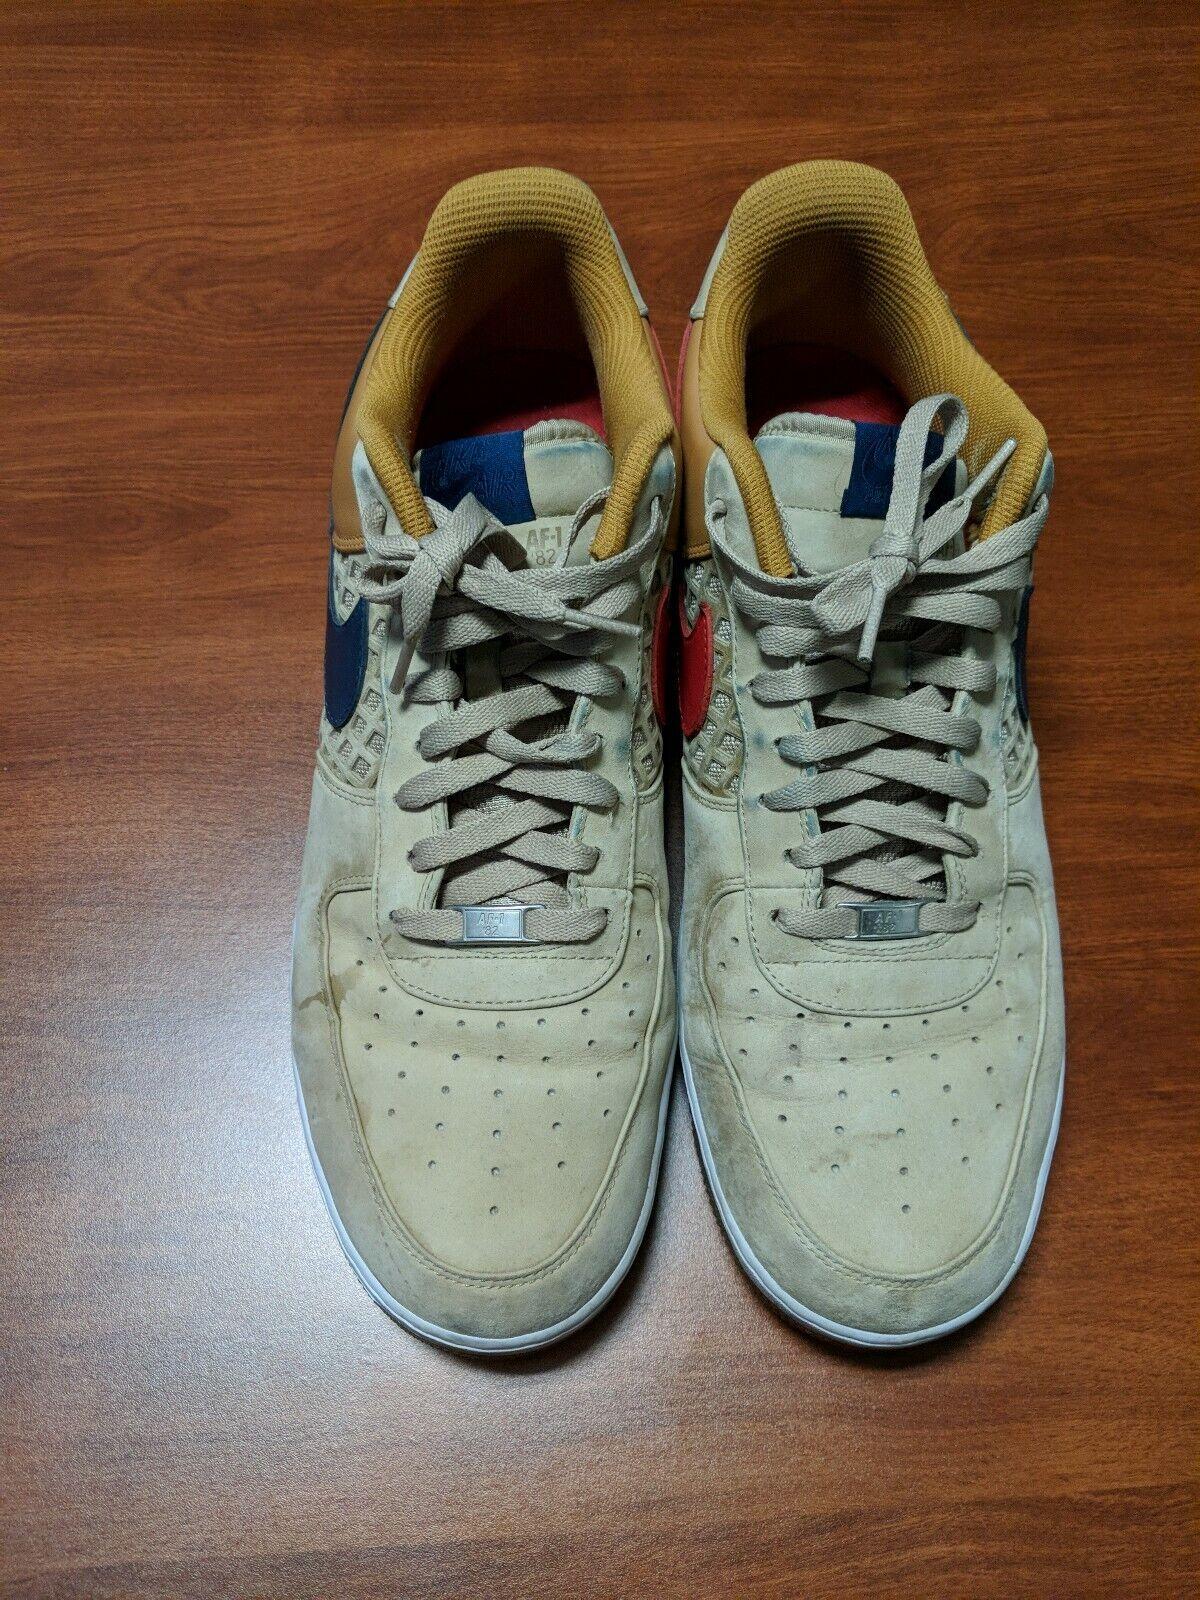 Mens Nike Air Force 1 Premium 2008 Beijing Tweed shoes size 16 US 318775-241